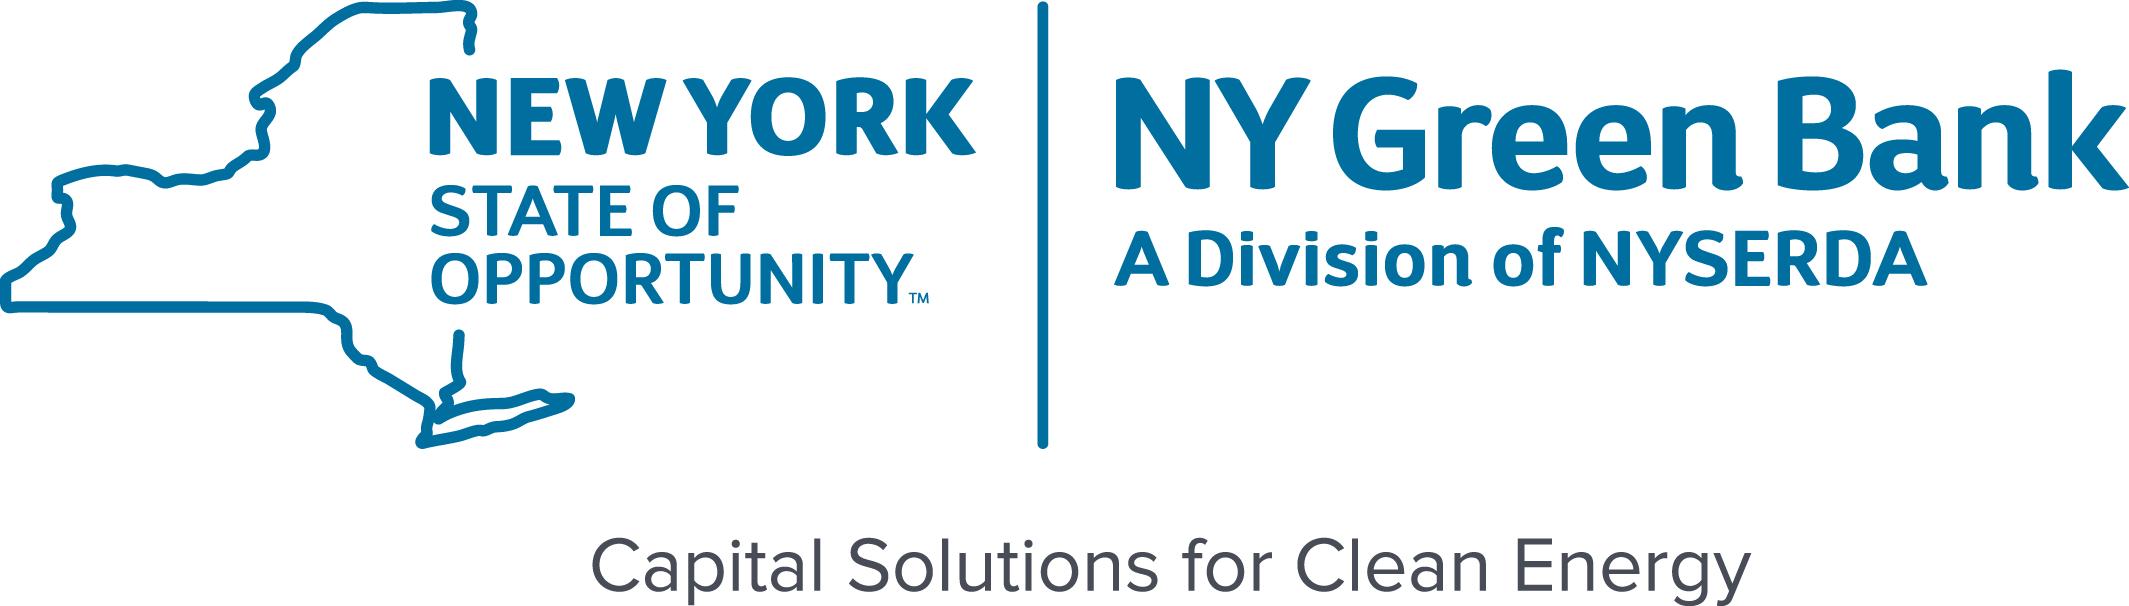 NY Green Bank_Capital_Solutions.png